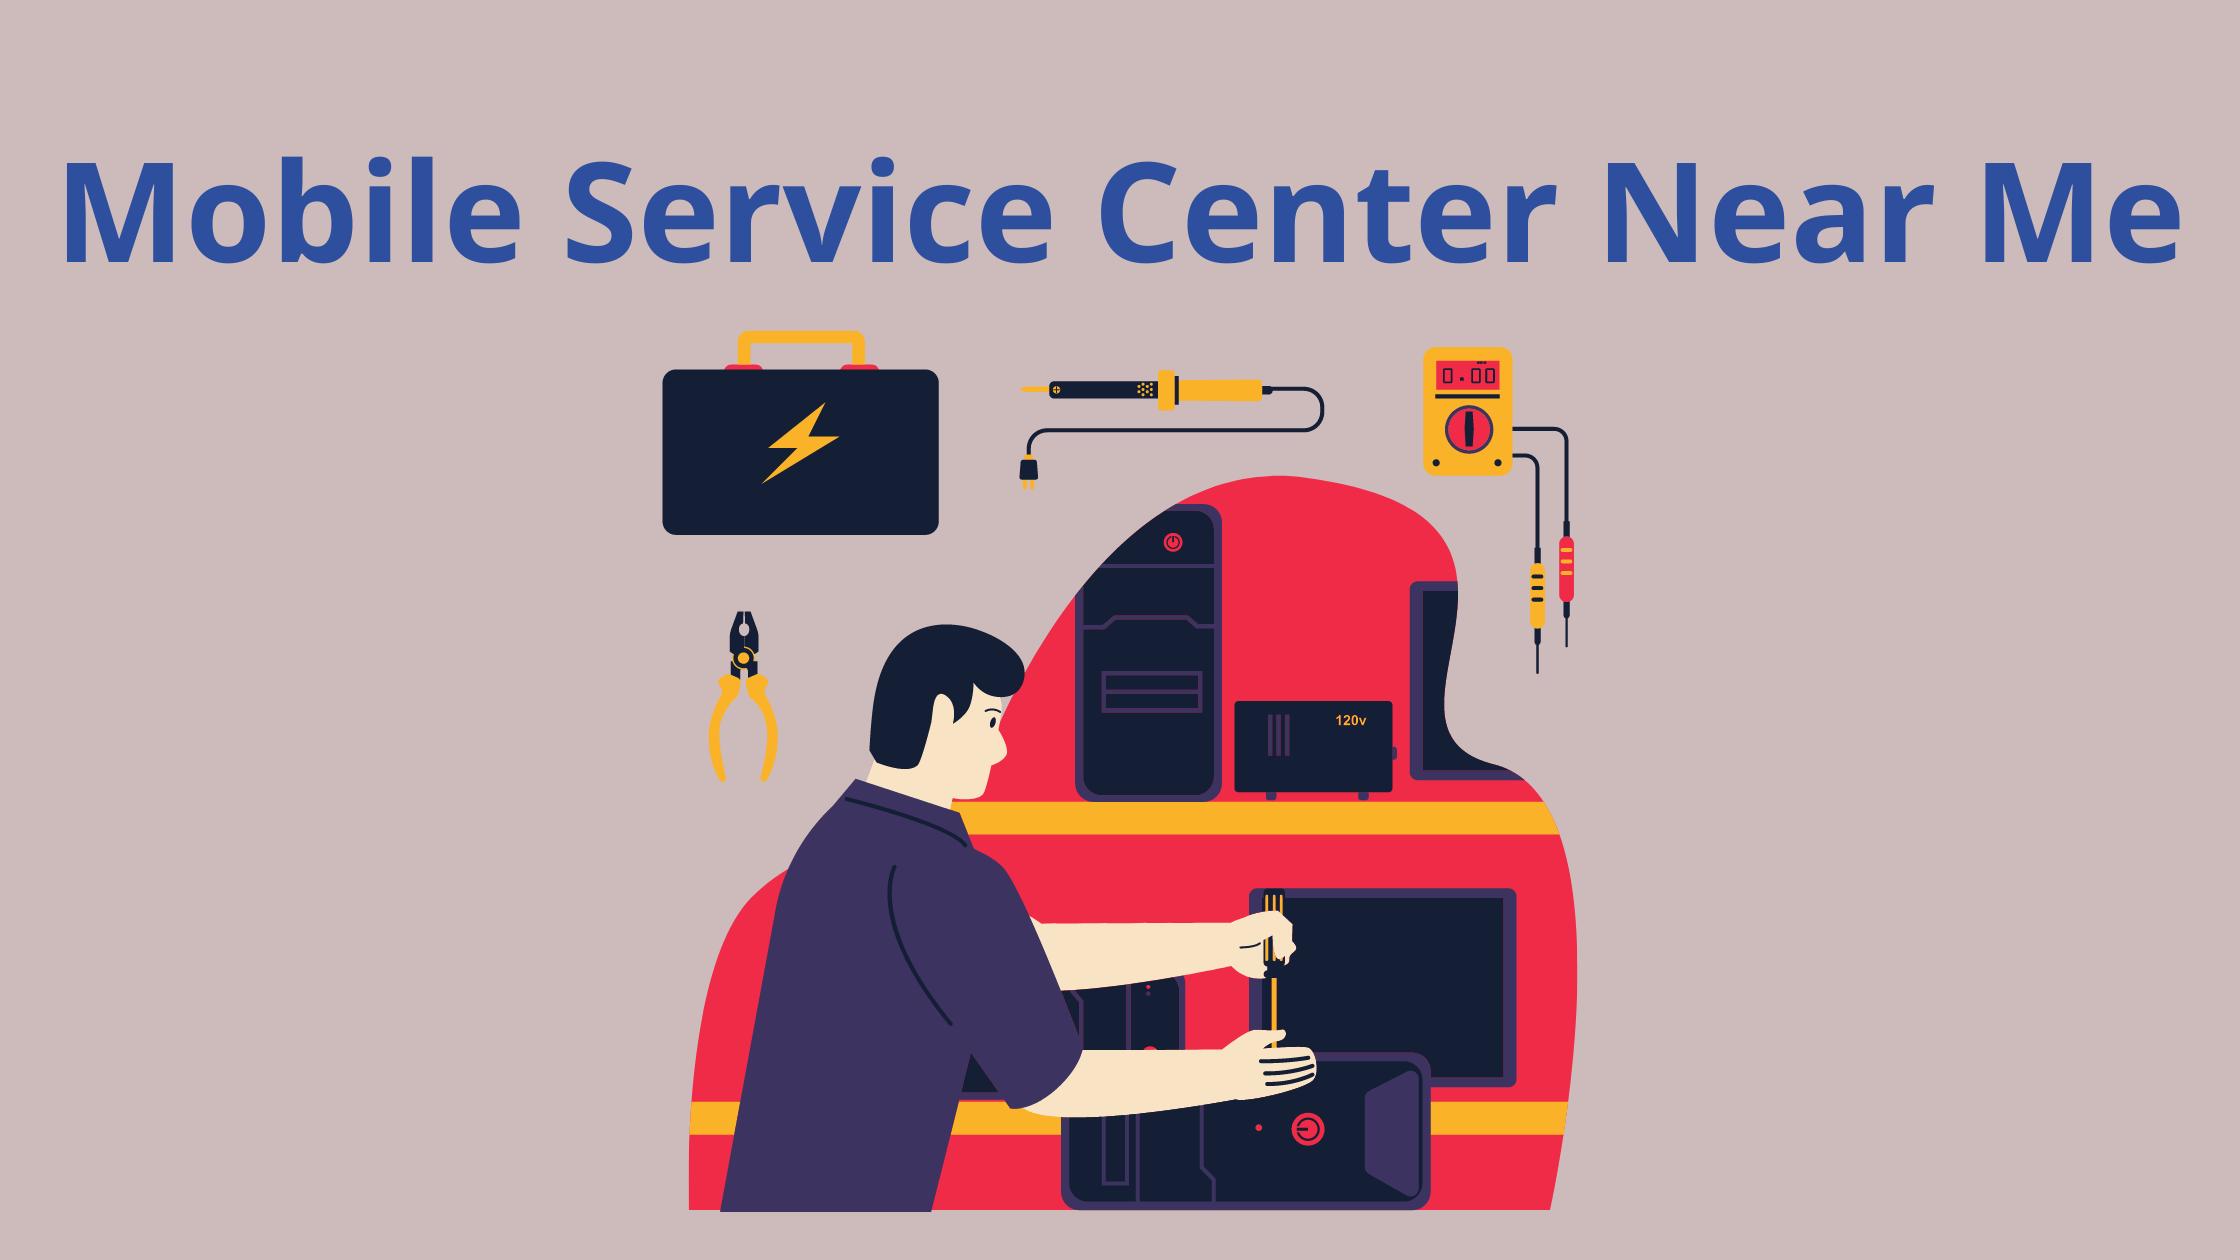 Mobile Service Center Near Me